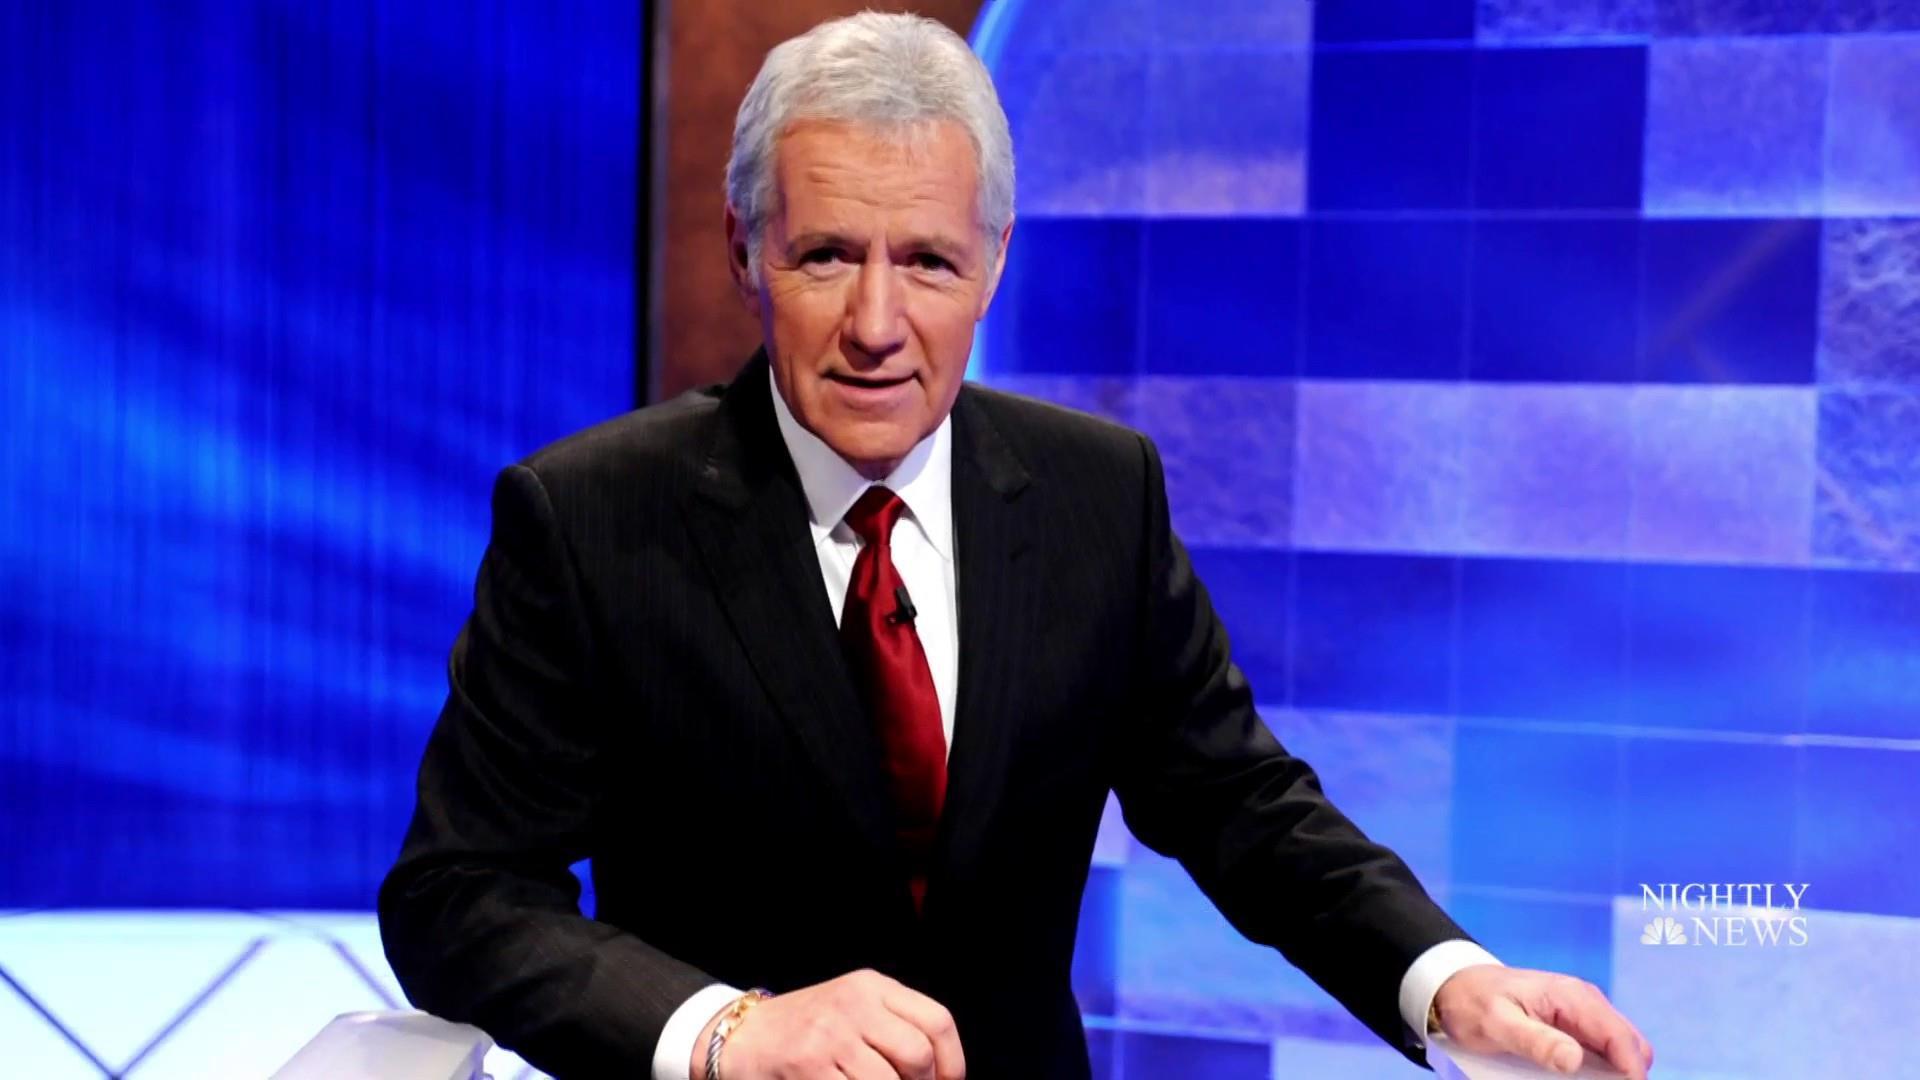 'Jeopardy' host Alex Trebek reveals he has stage 4 pancreatic cancer